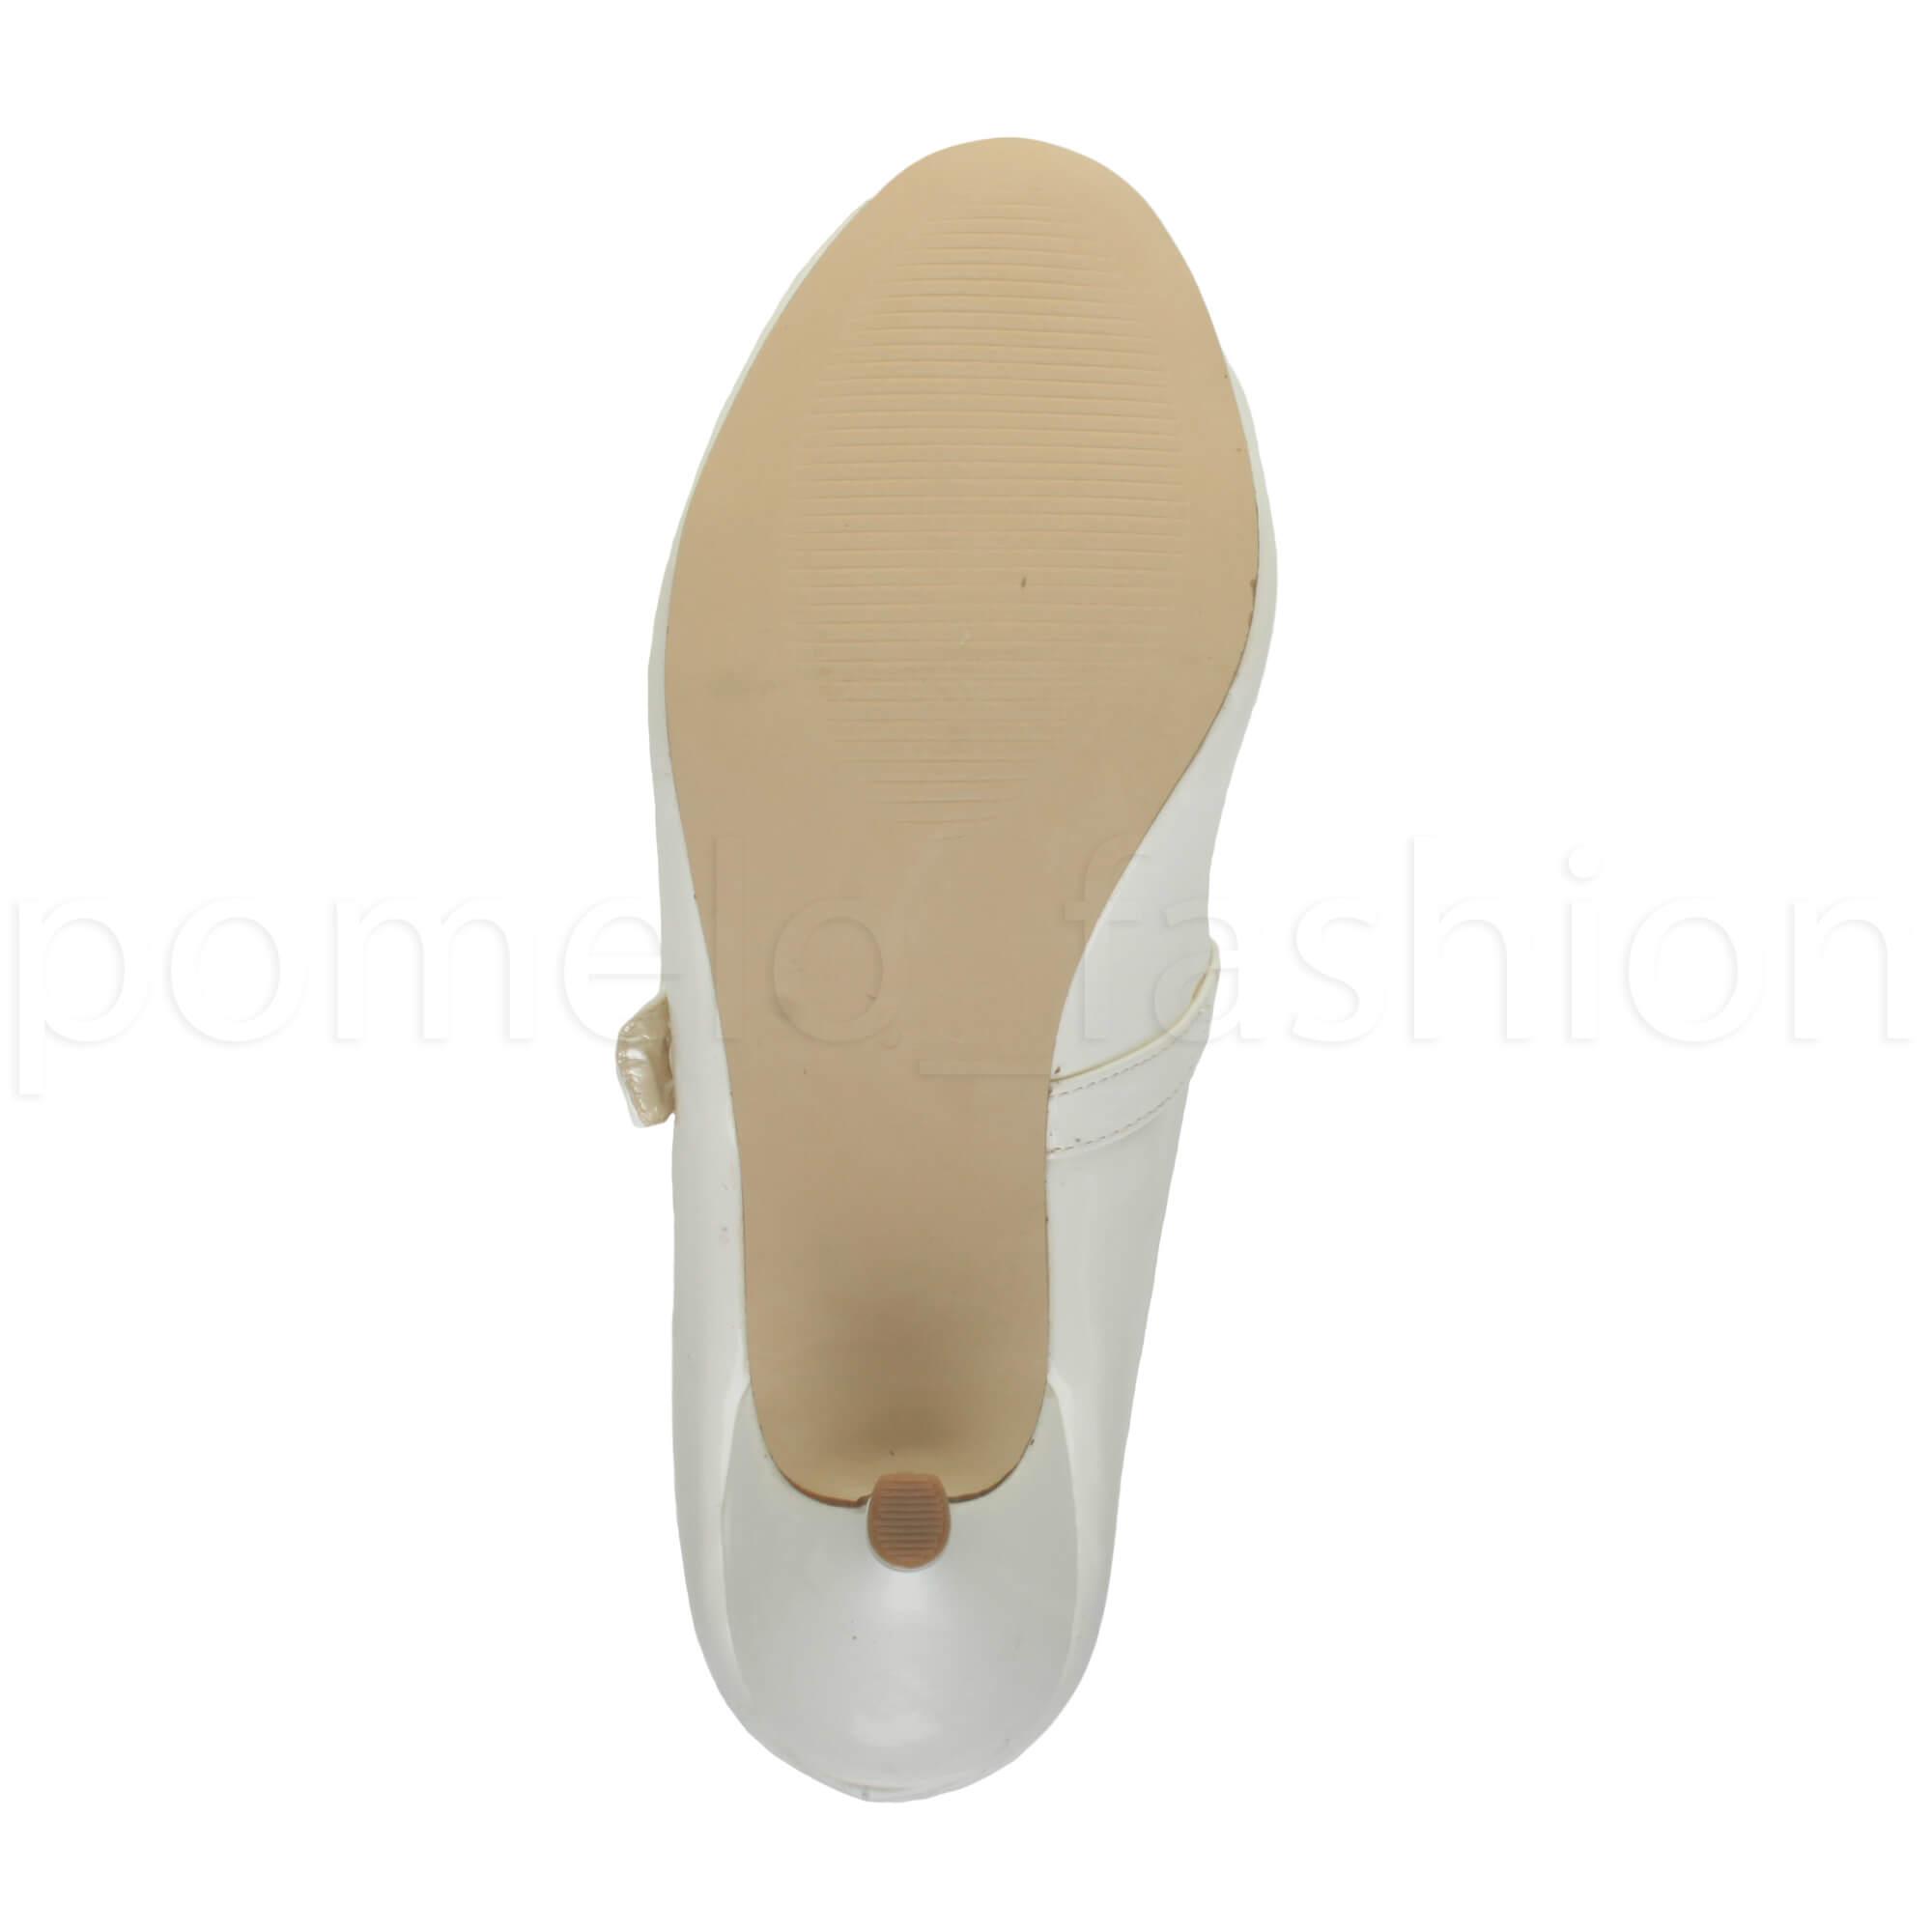 miniatura 183 - Donna basso tacco medio Mary Jane Damigella Matrimonio Pompe Scarpe Da Sera Taglia